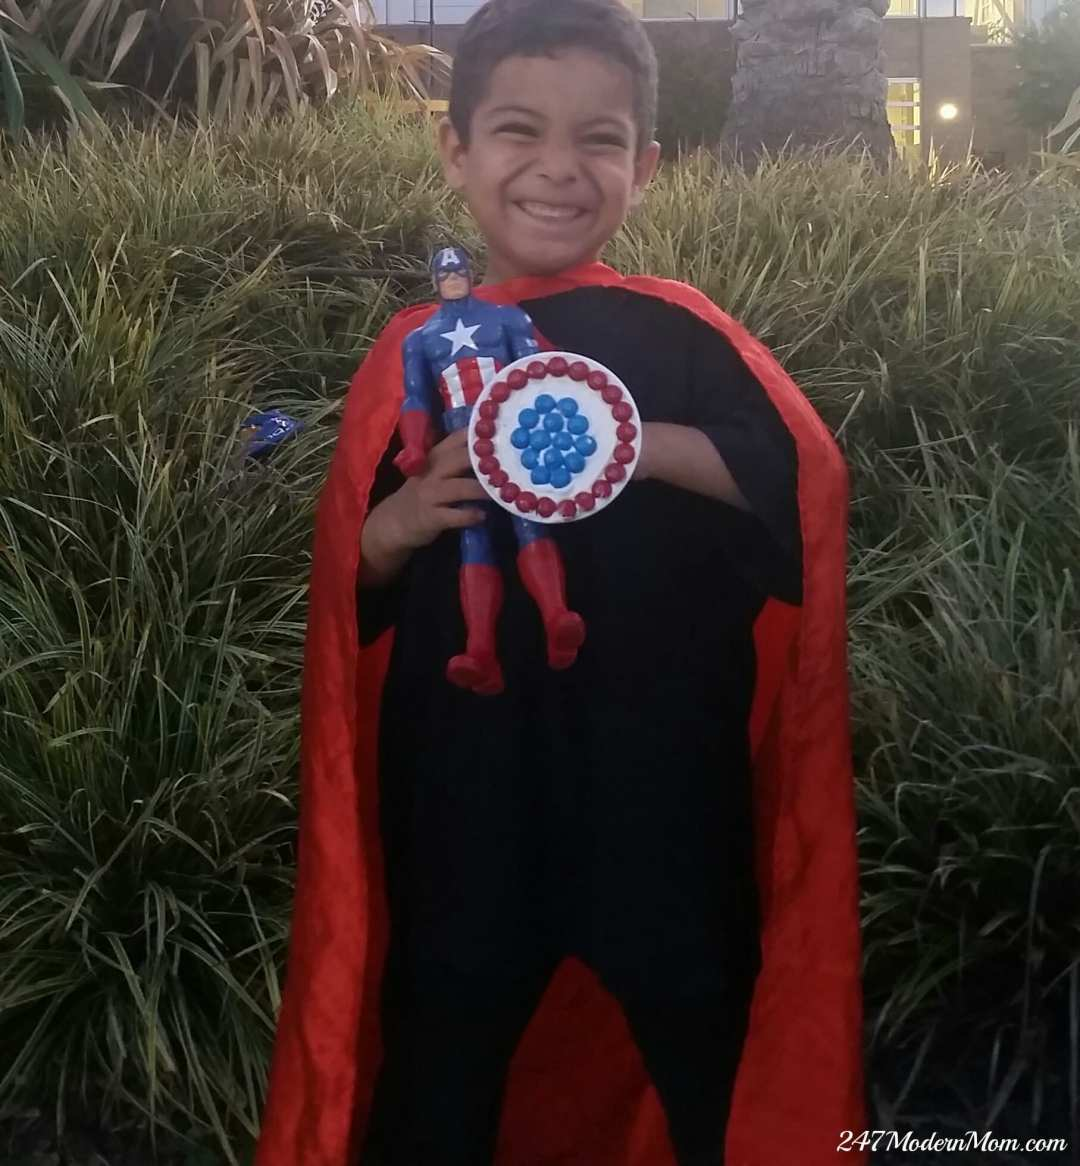 #HeroesEatMMs #Shop CollectiveBias Captain America